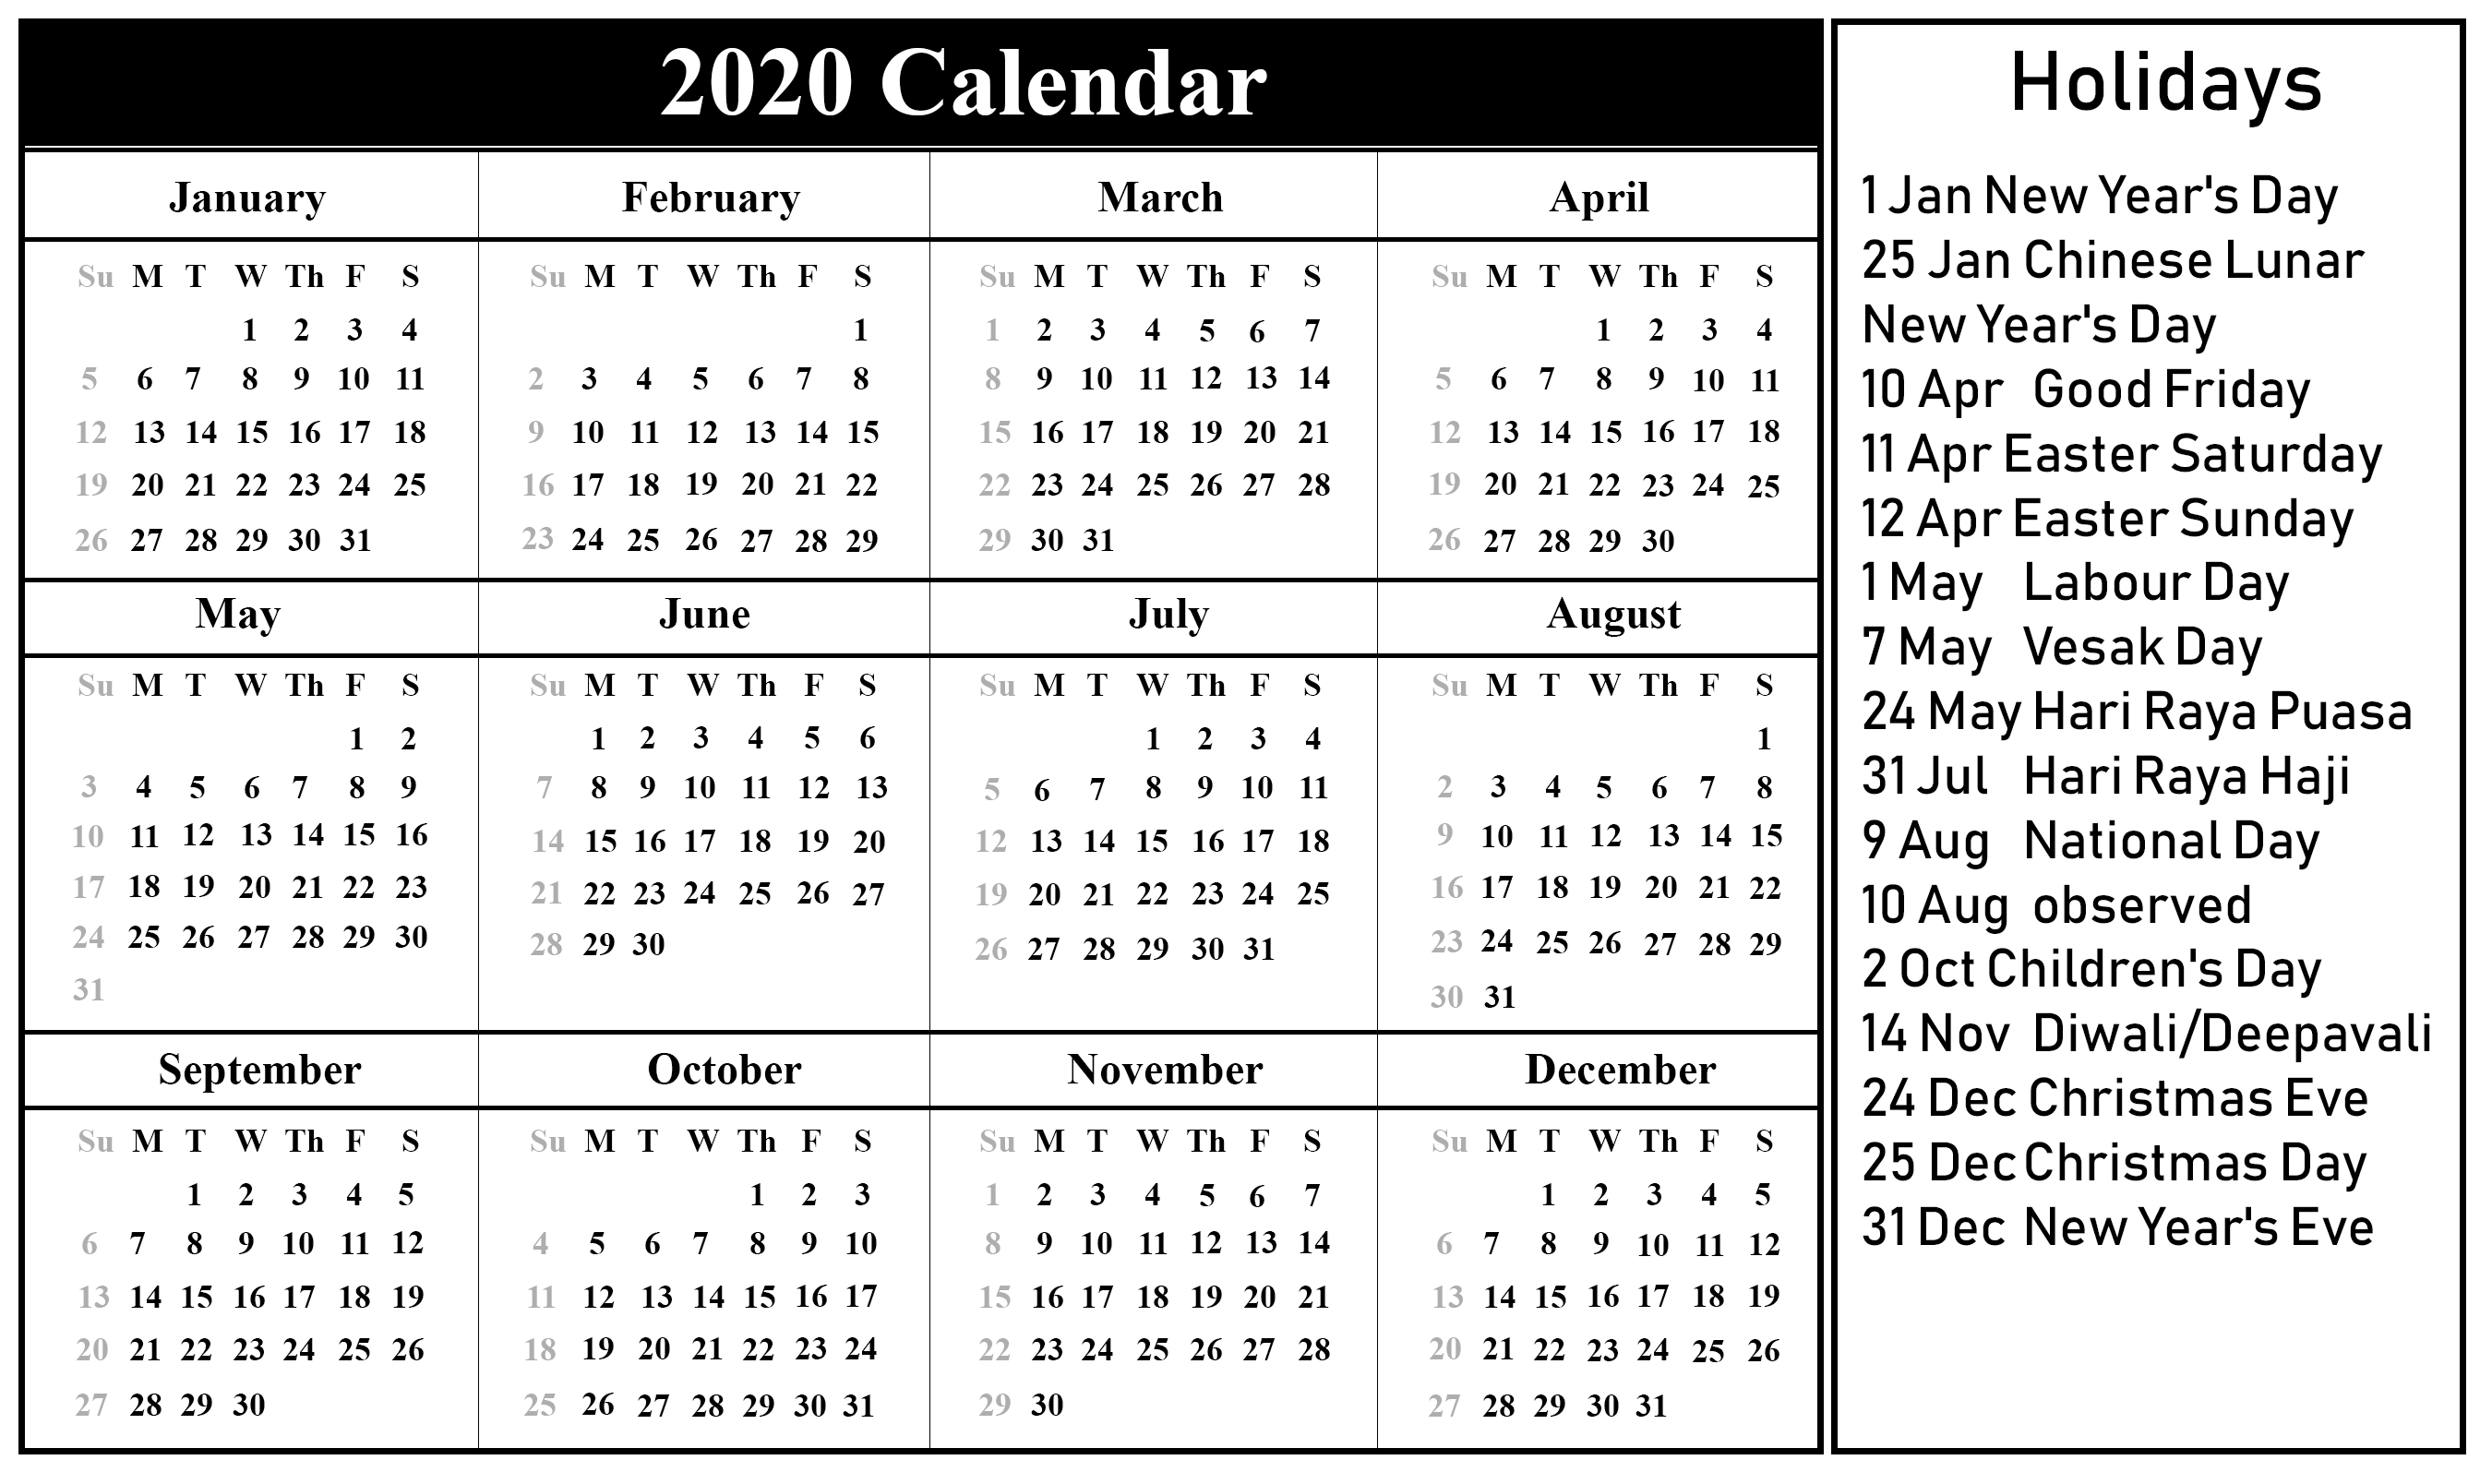 Printable 2020 Calendar With Holidays | Holiday Calendar